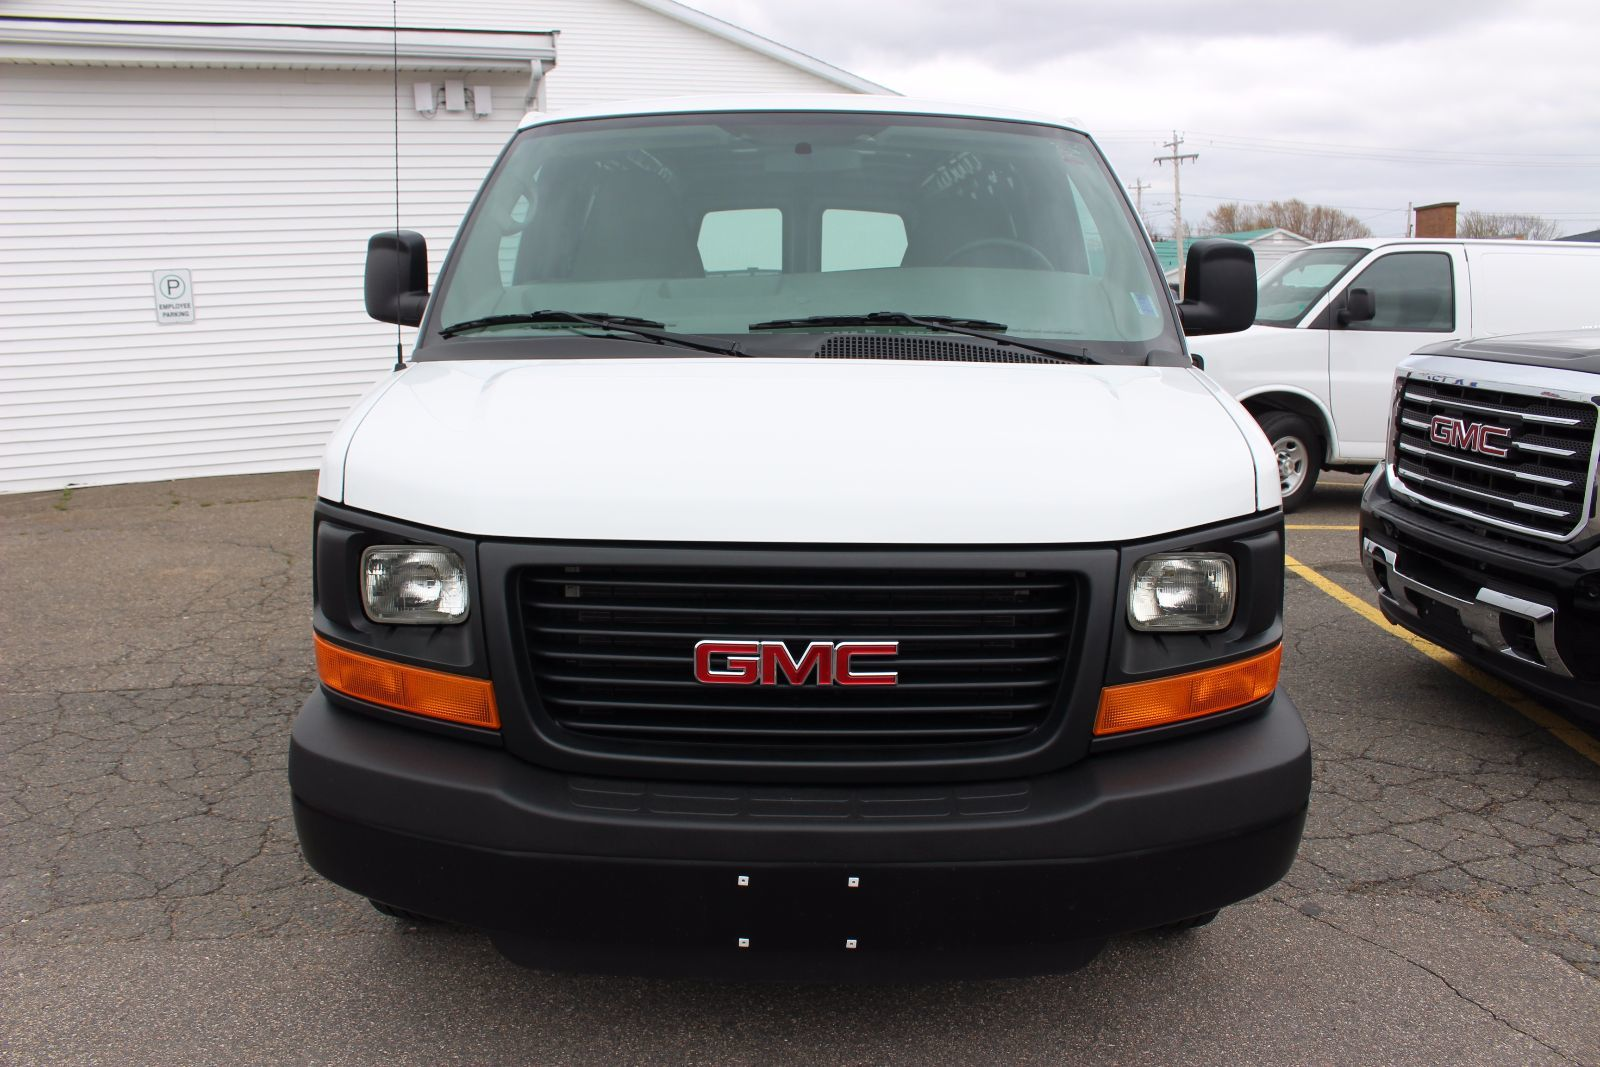 used 2015 gmc savana 2500 4 8l 8 cyl automatic rwd cargo van in middleton l1474. Black Bedroom Furniture Sets. Home Design Ideas